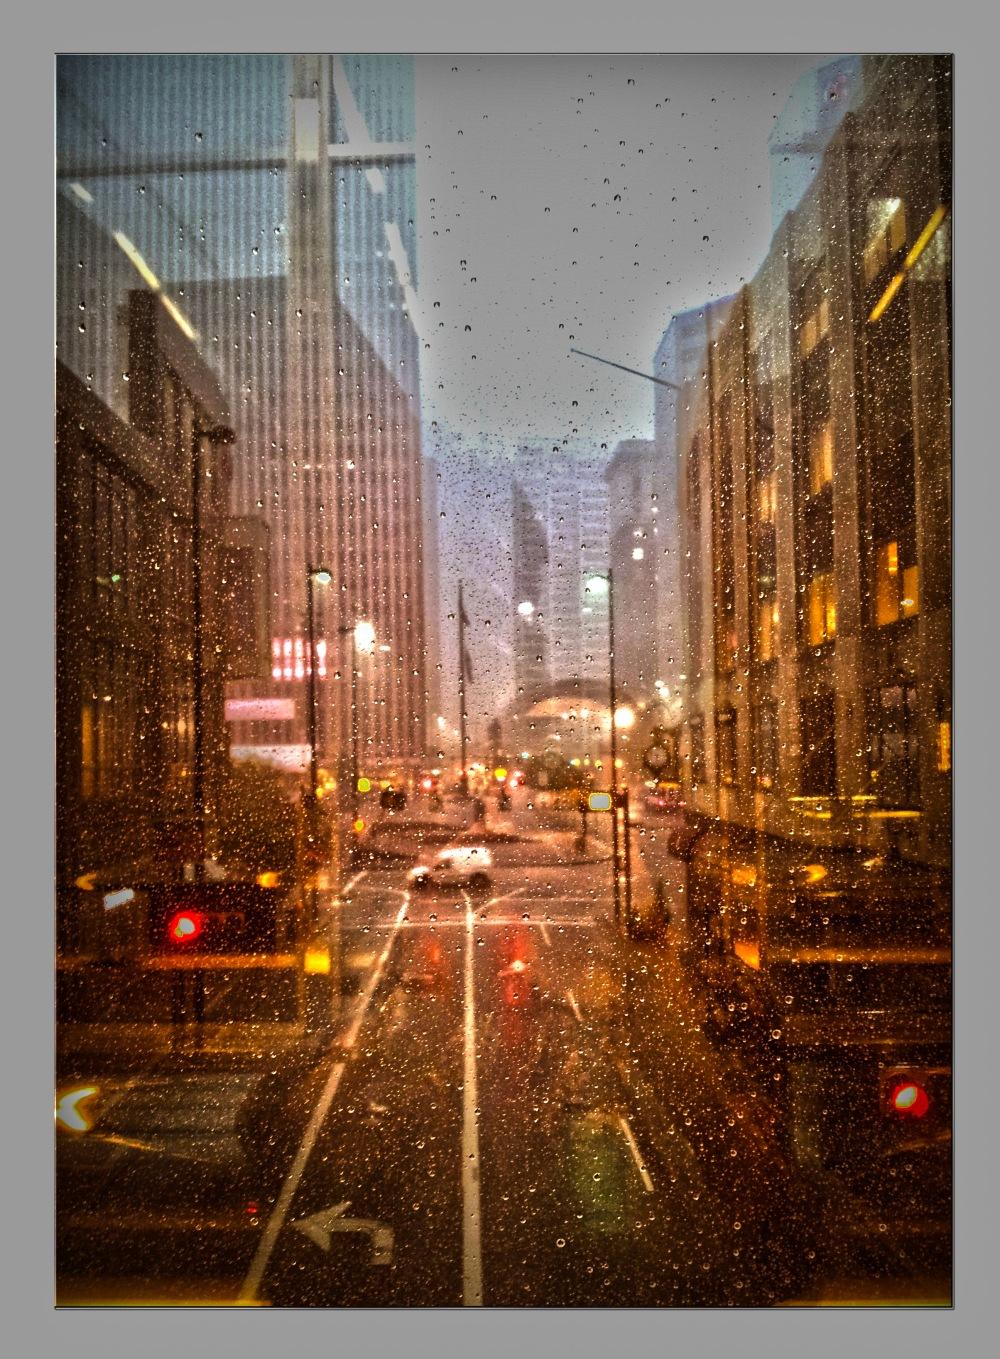 City Rains2